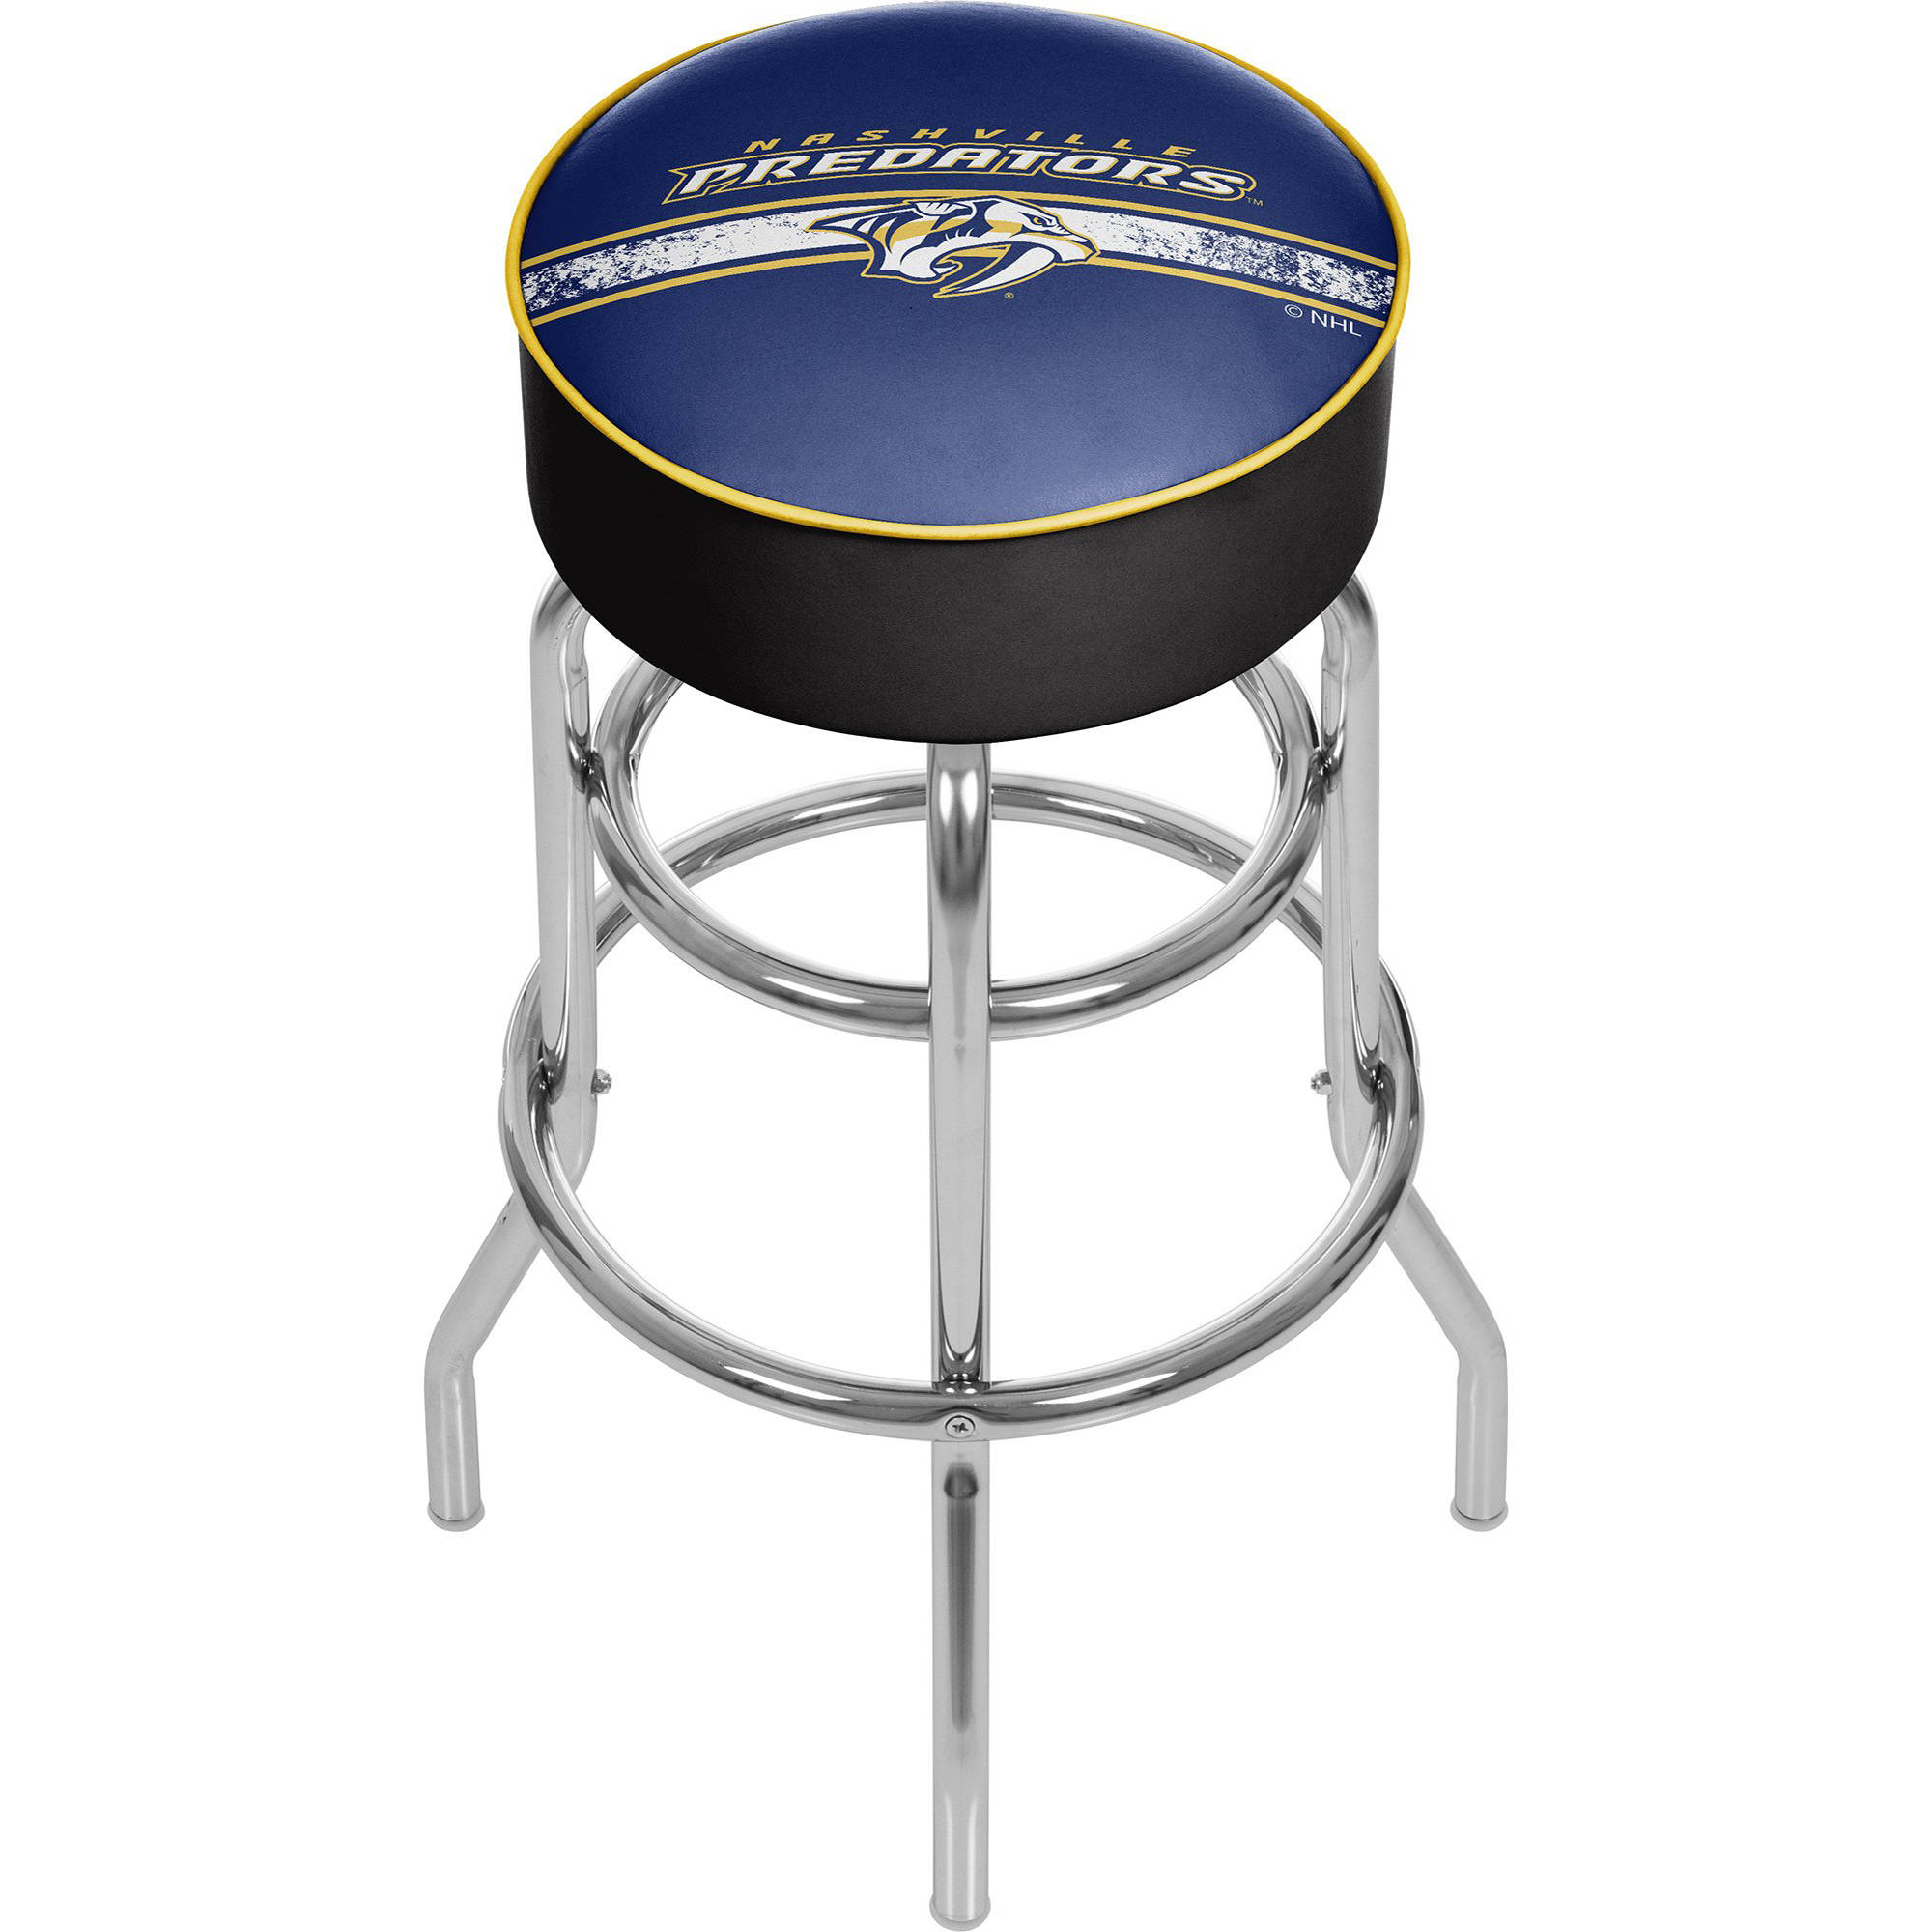 NHL Chrome Bar Stool with Swivel, Nashville Predators